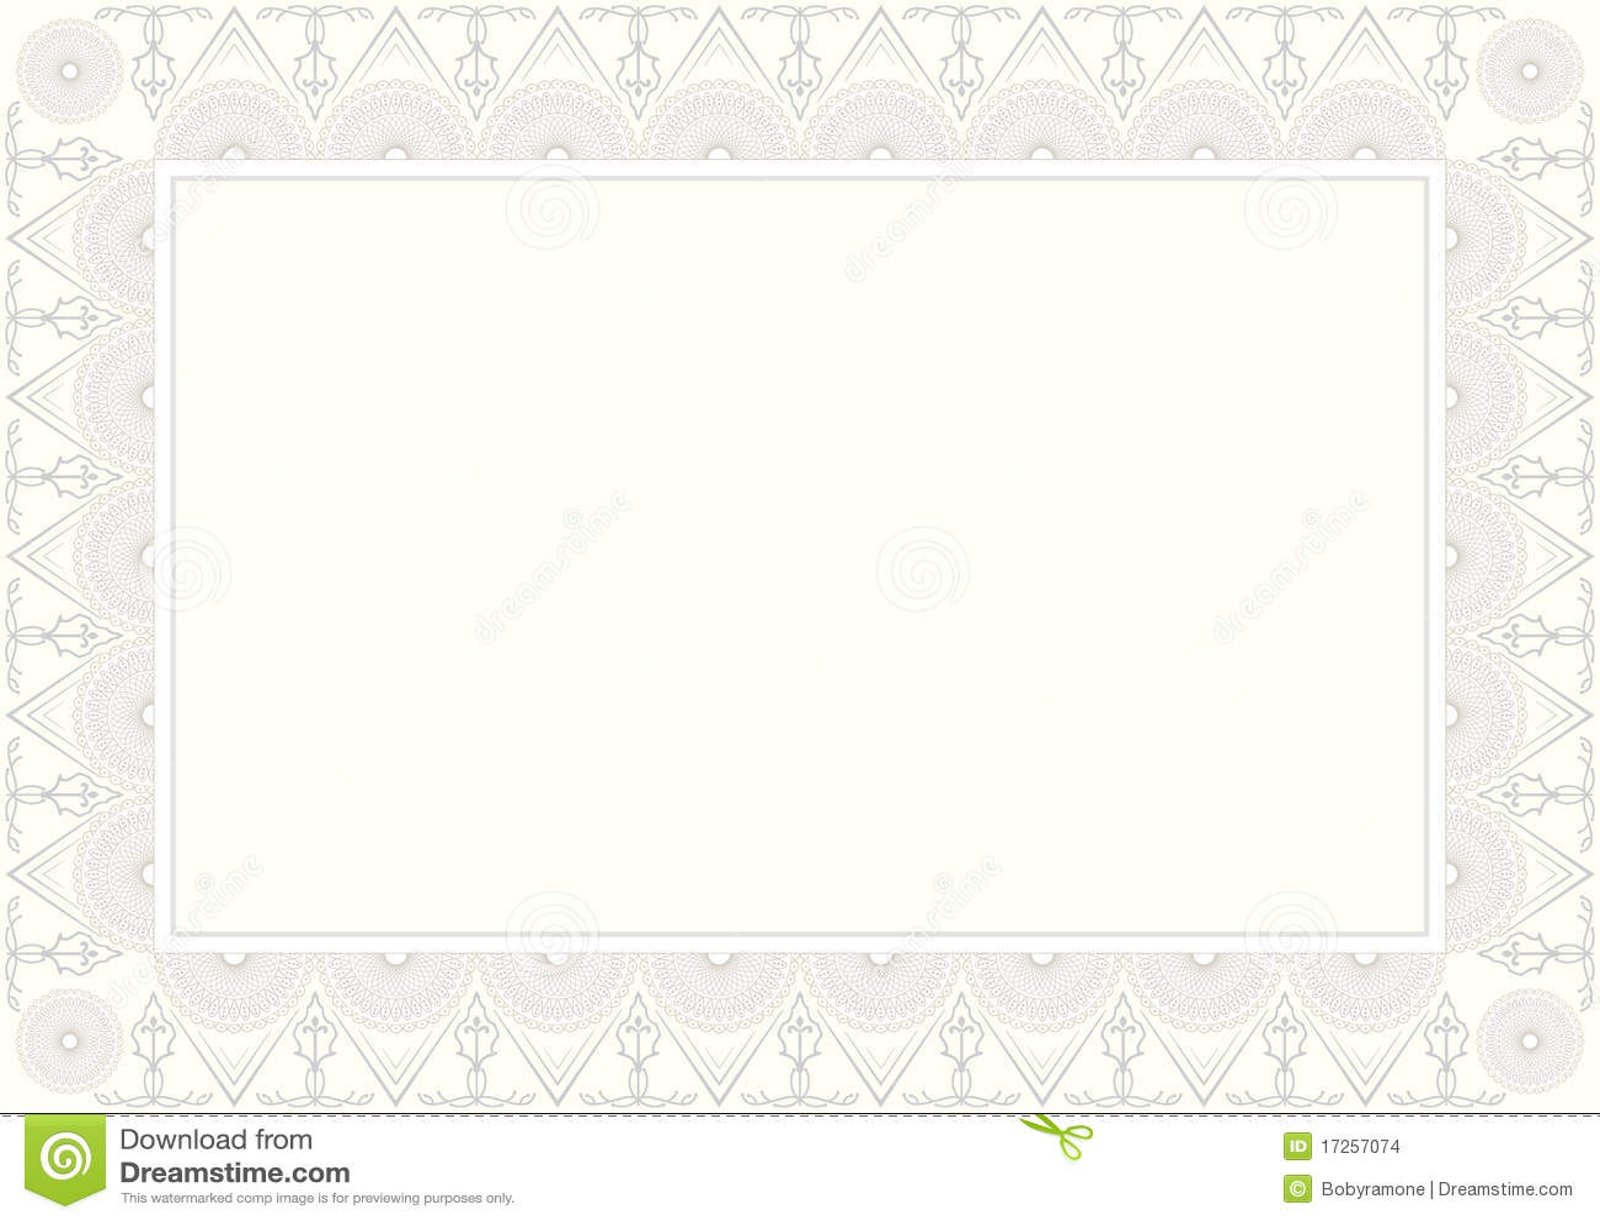 background certificate